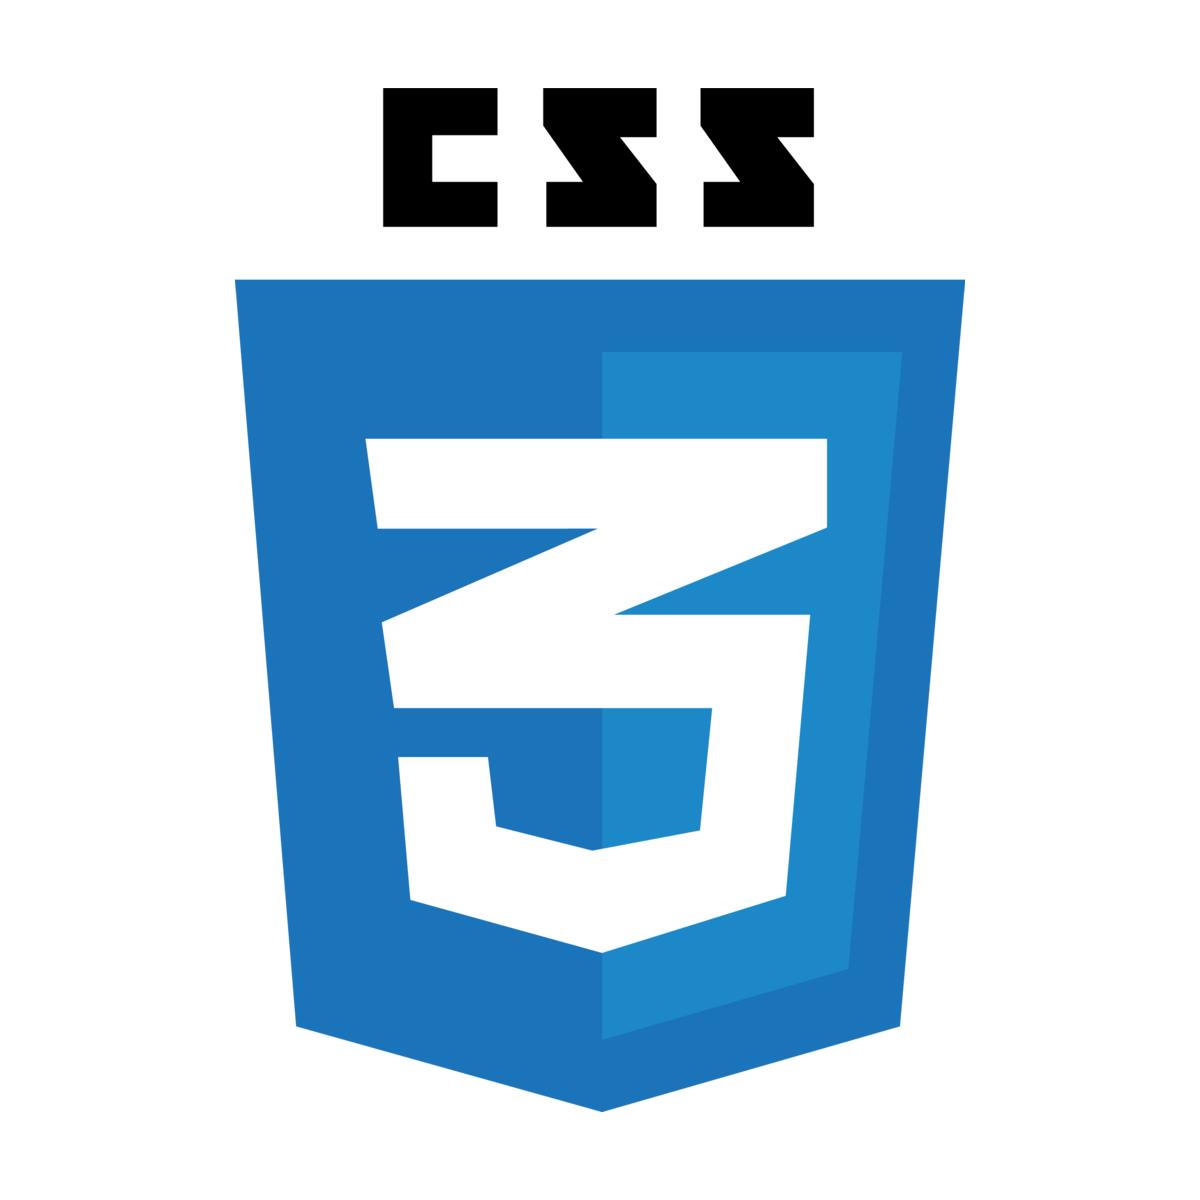 [CSS]半円を表示する方法(半円上、半円下、半円左、半円右)